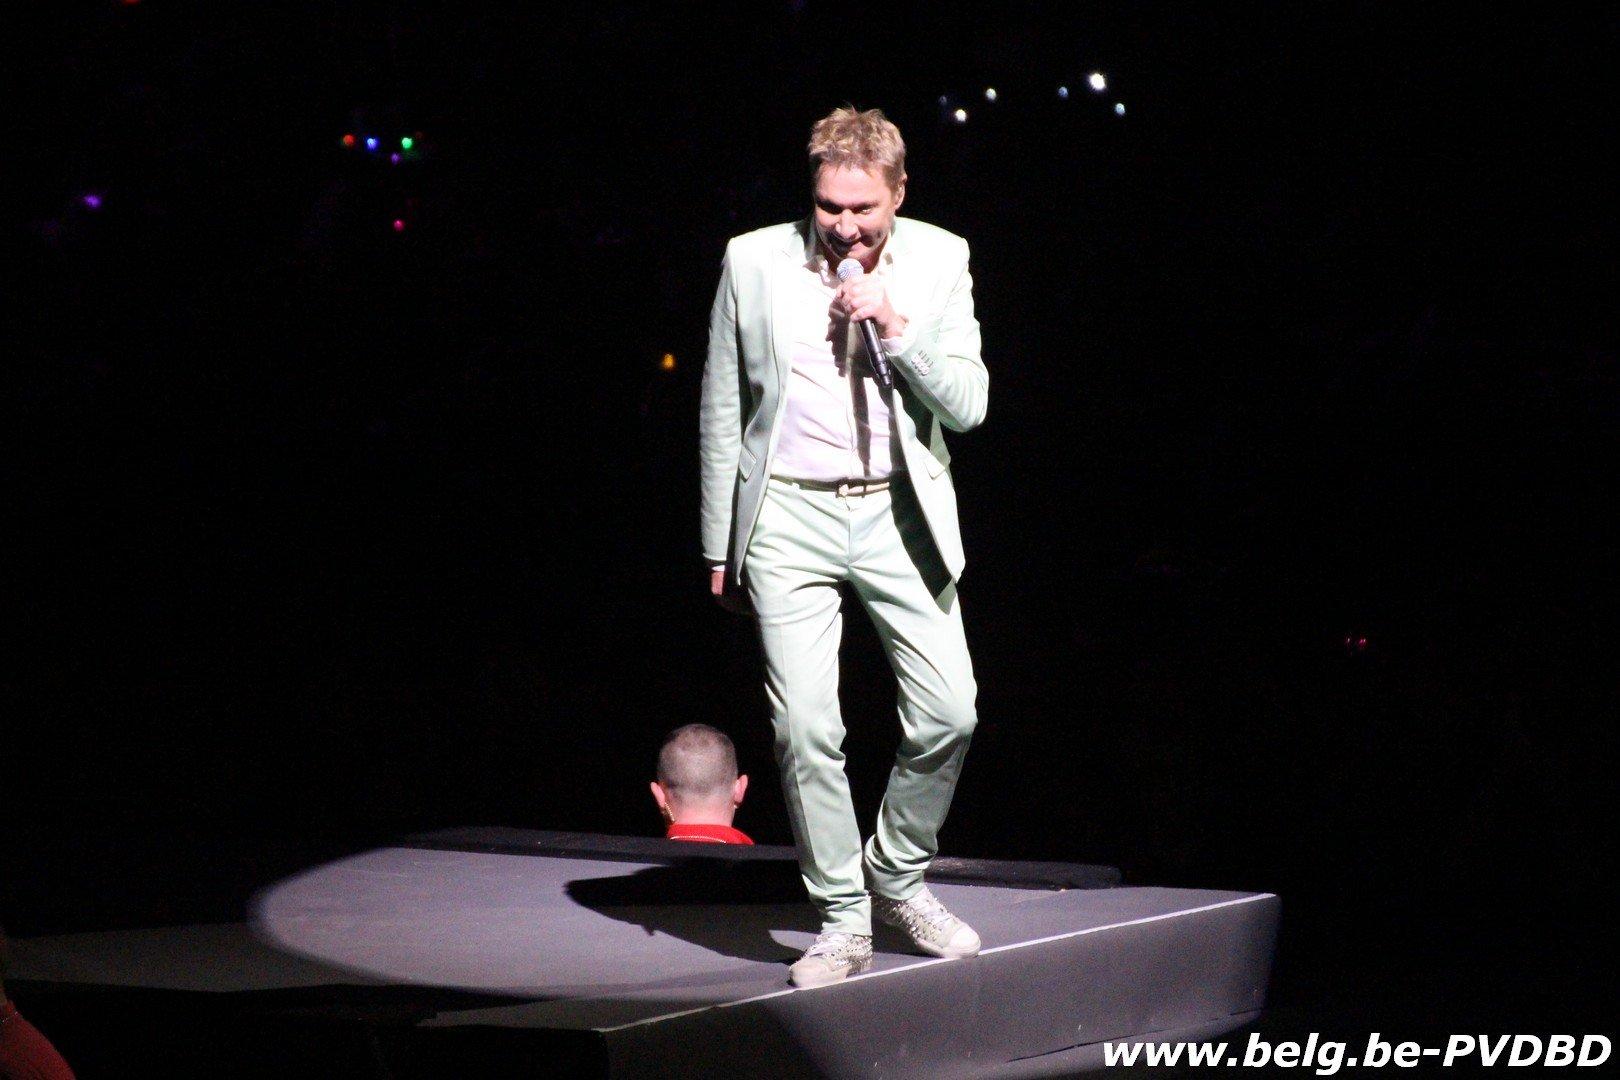 Luc Appermont nieuwe presentator Het Schlagerfestival in 2020! - IMG 7139